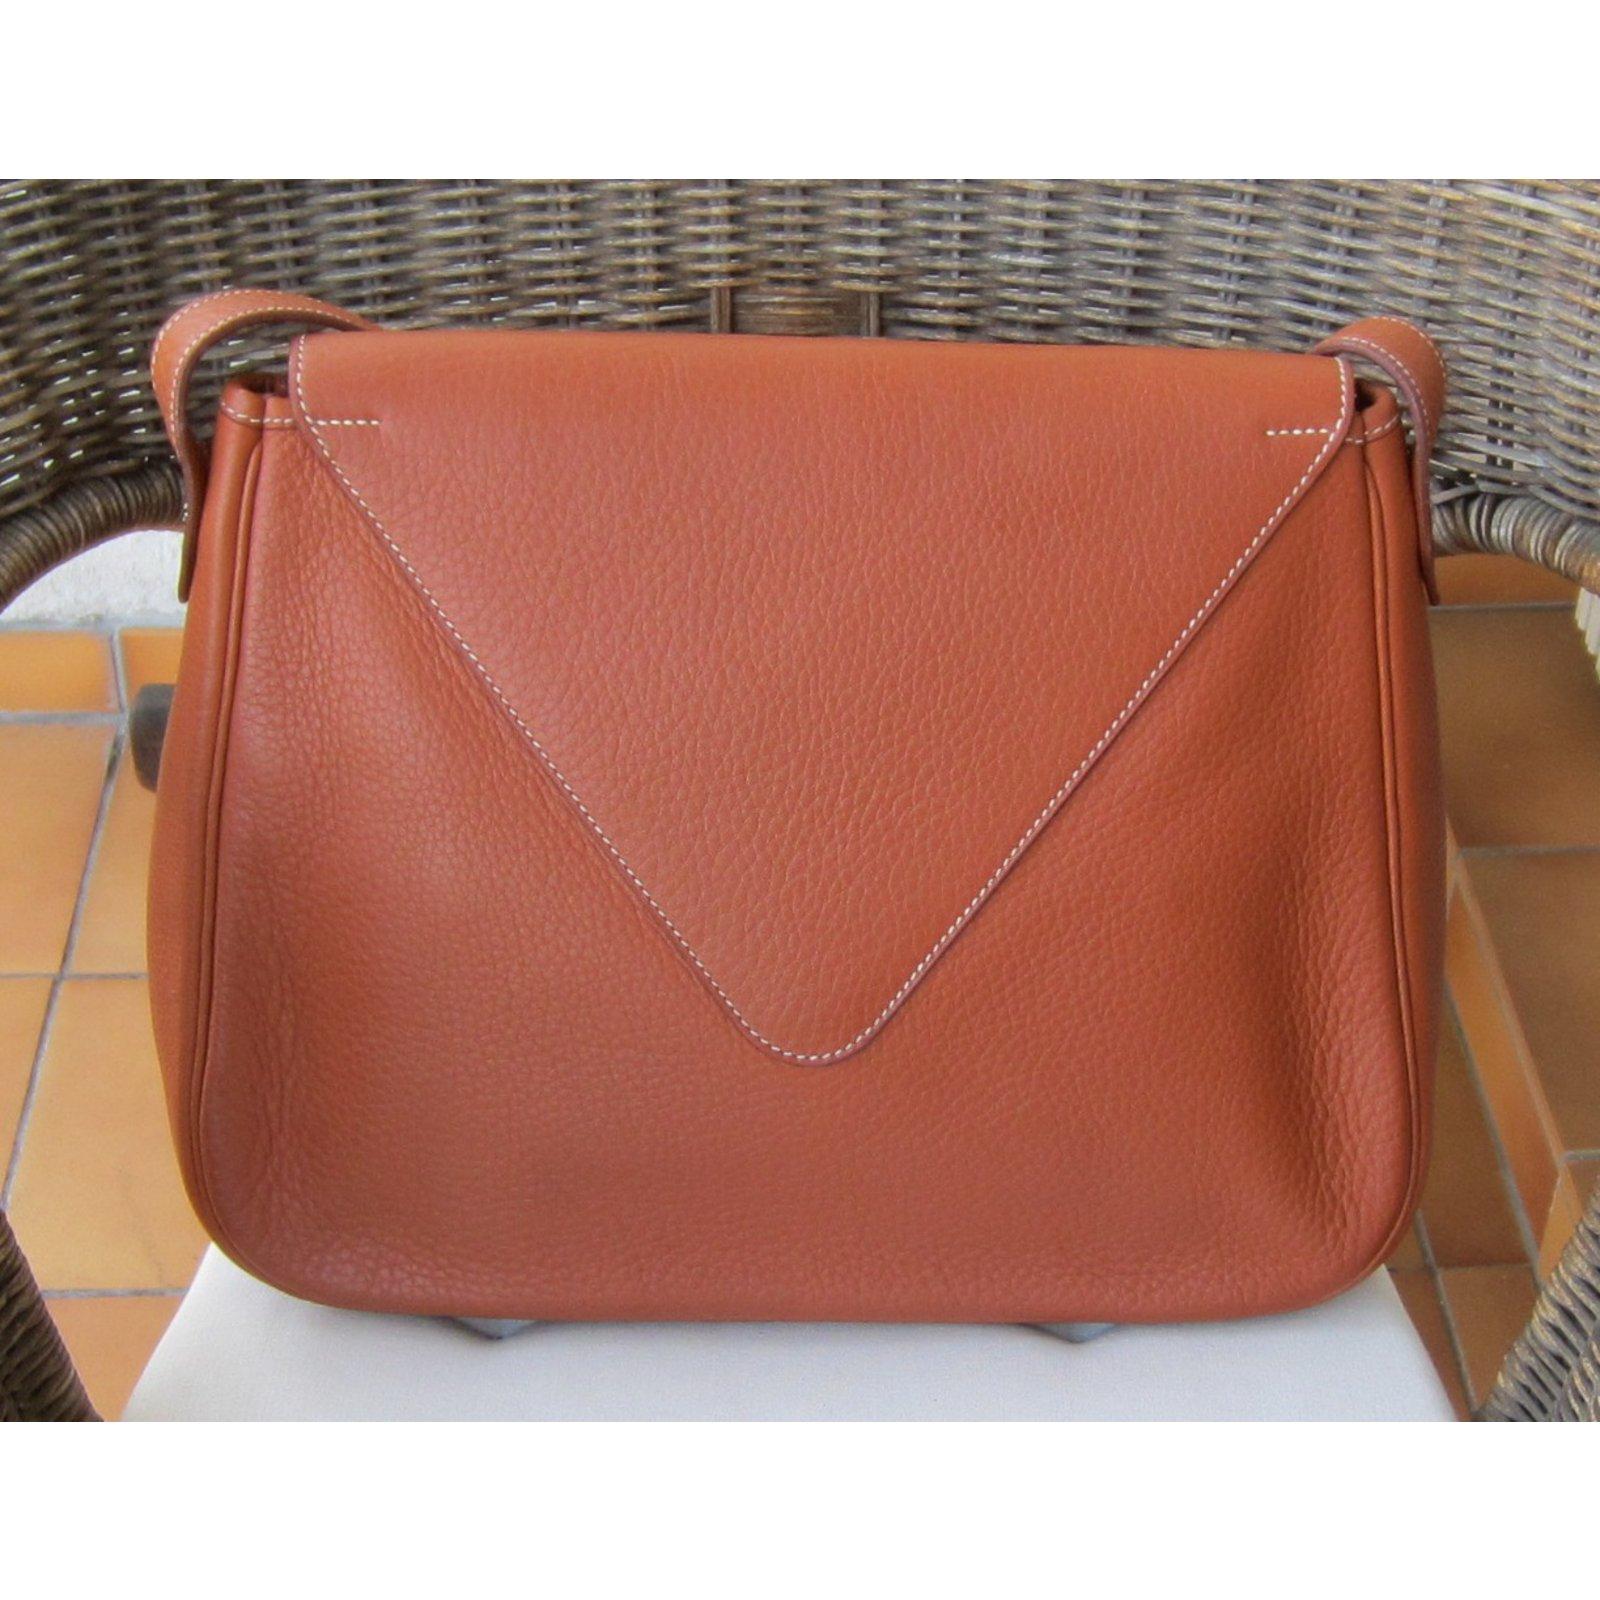 03d0e0bad017 Hermès Christine 35 cm Handbags Leather Red ref.46781 - Joli Closet